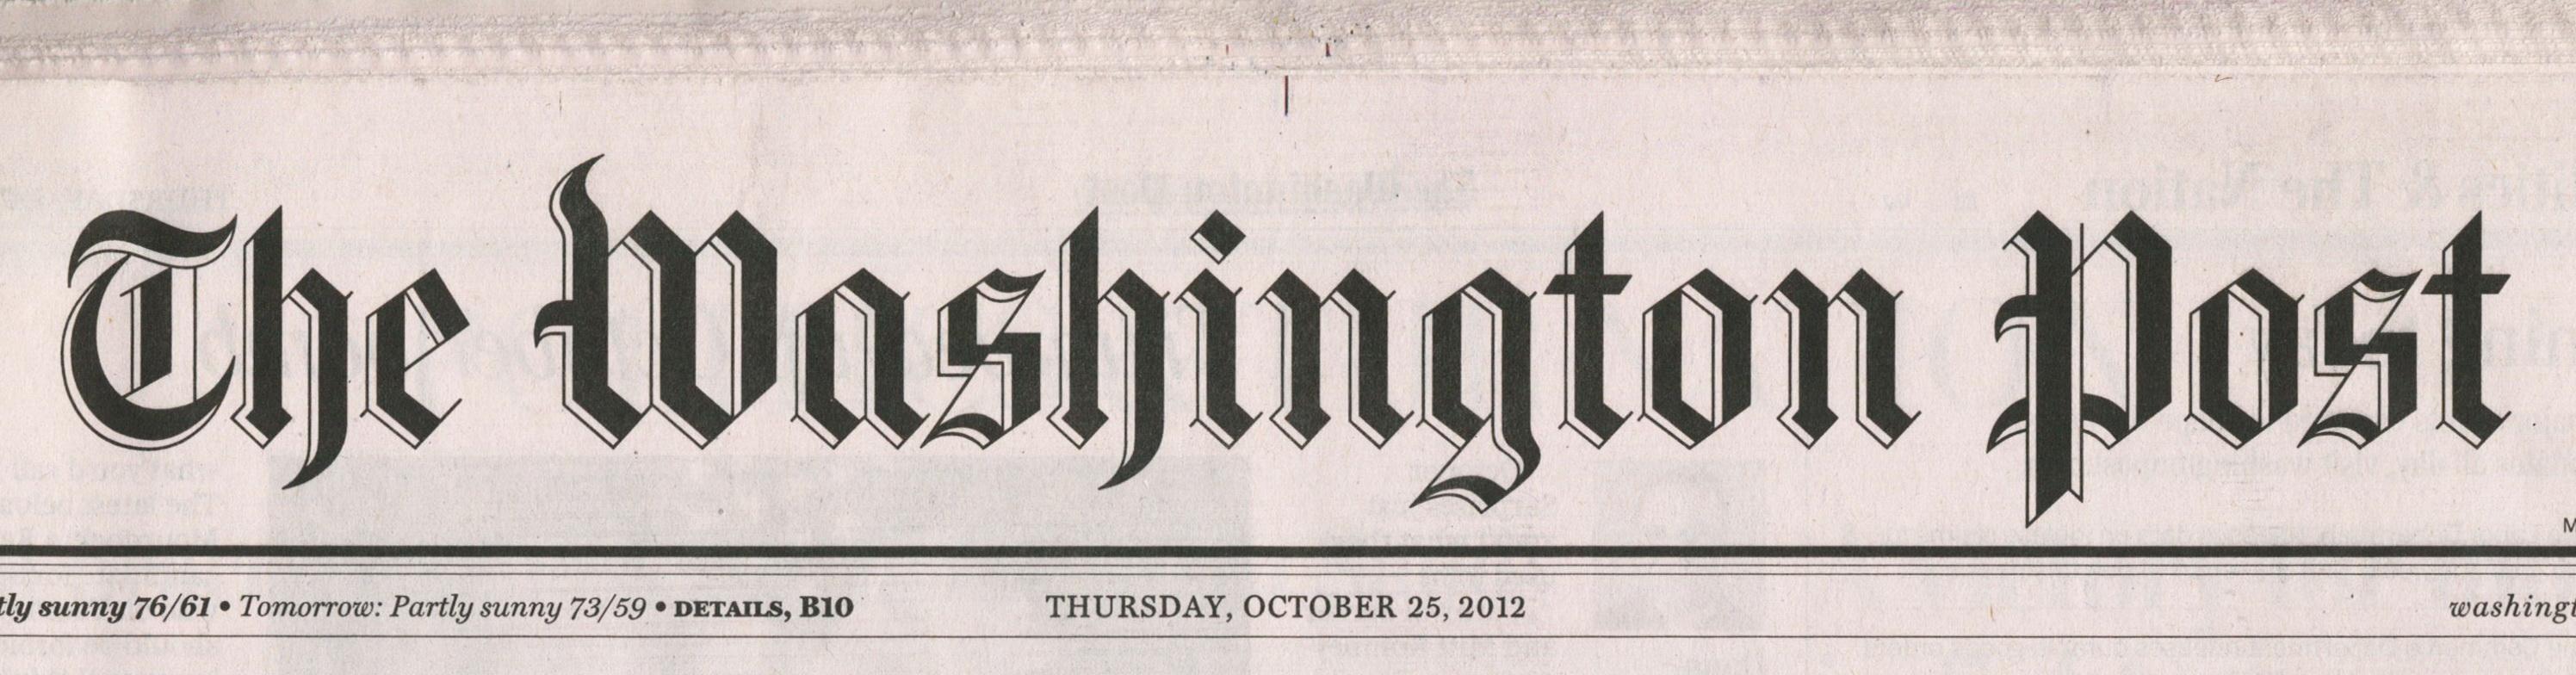 THE WASHINGTON POST - Page 7 Washington-Post-Headline-bdp-2012